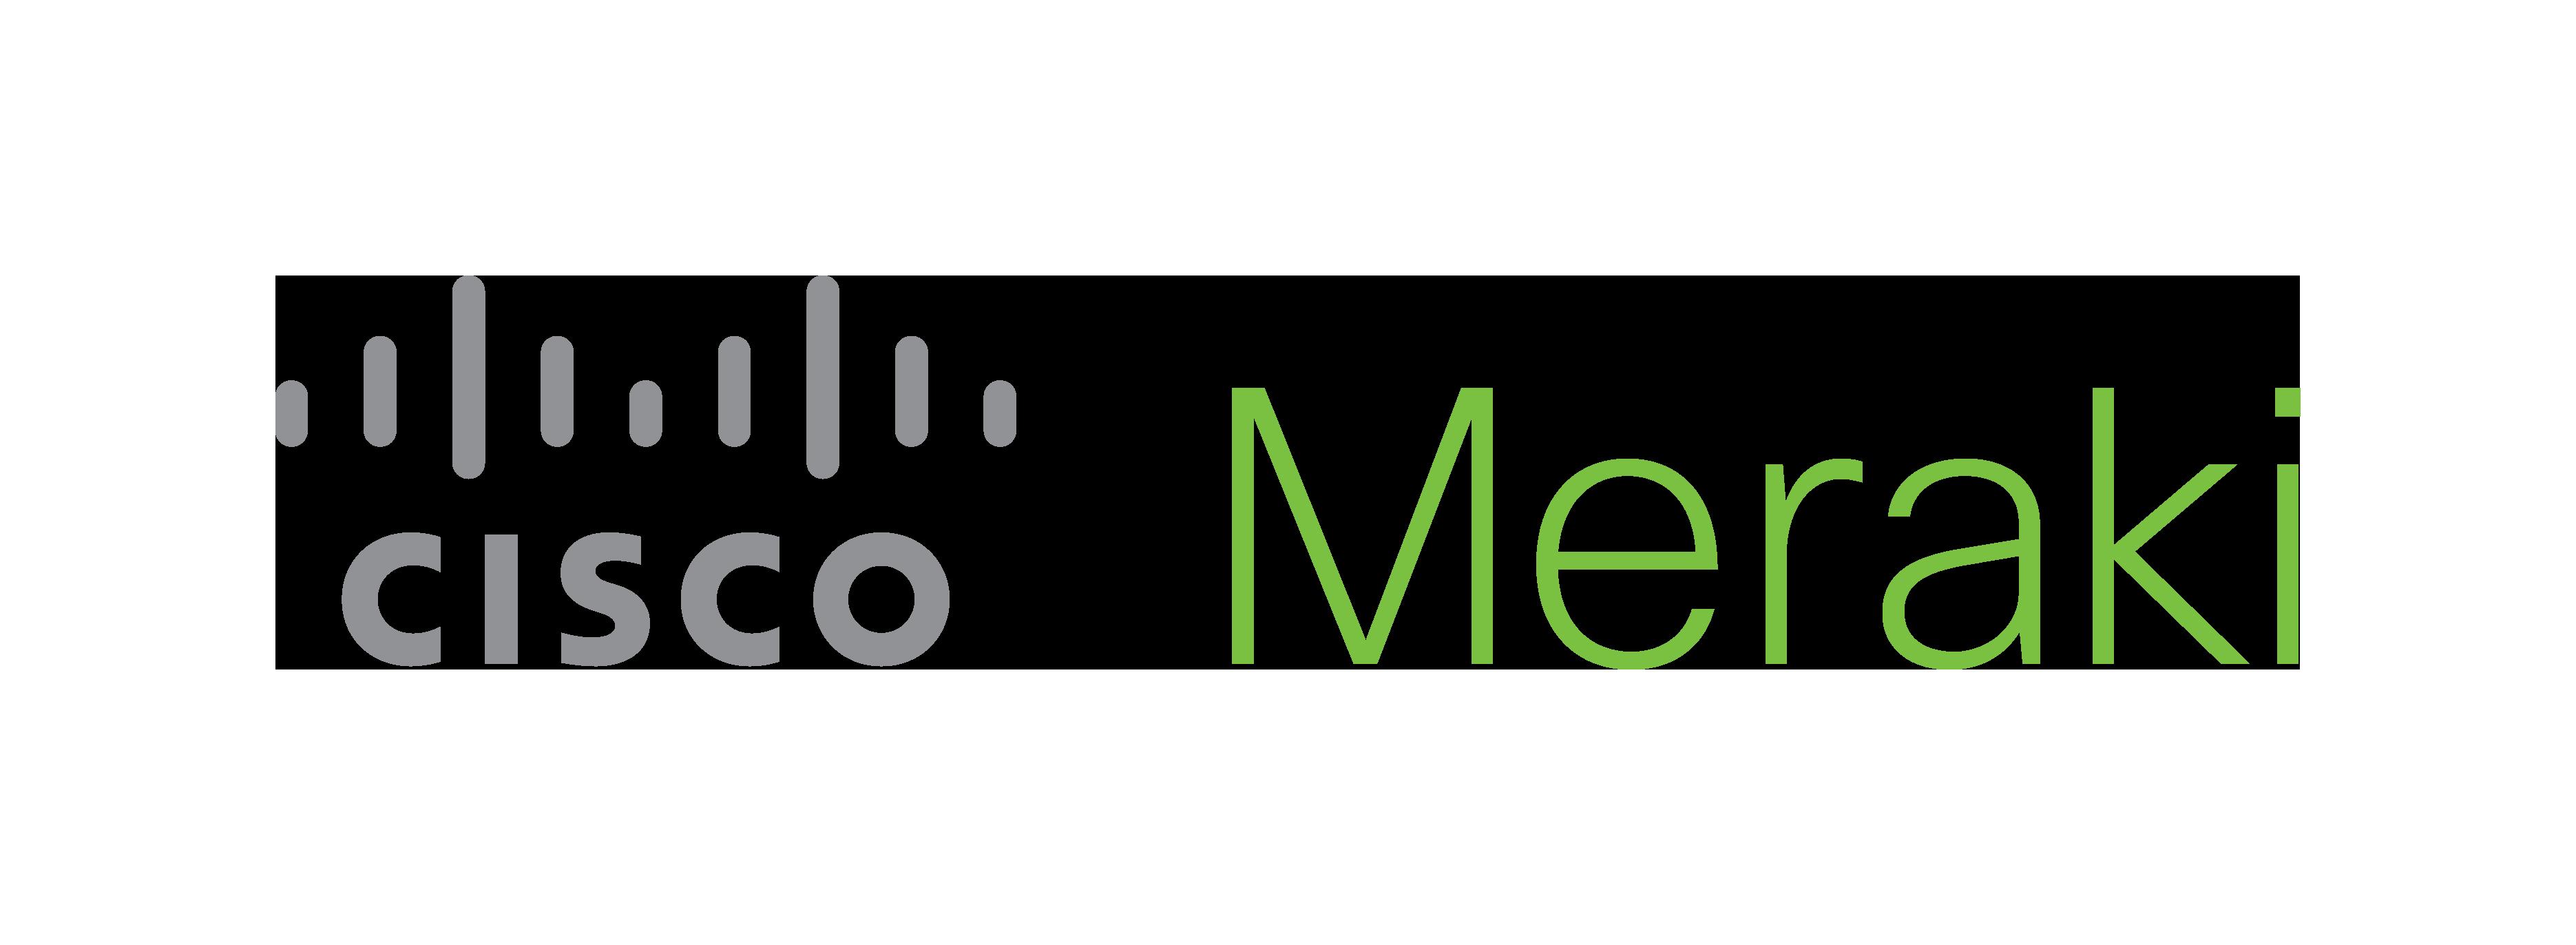 Cisco Meraki Partner in Portland Oregon Matrix Networks